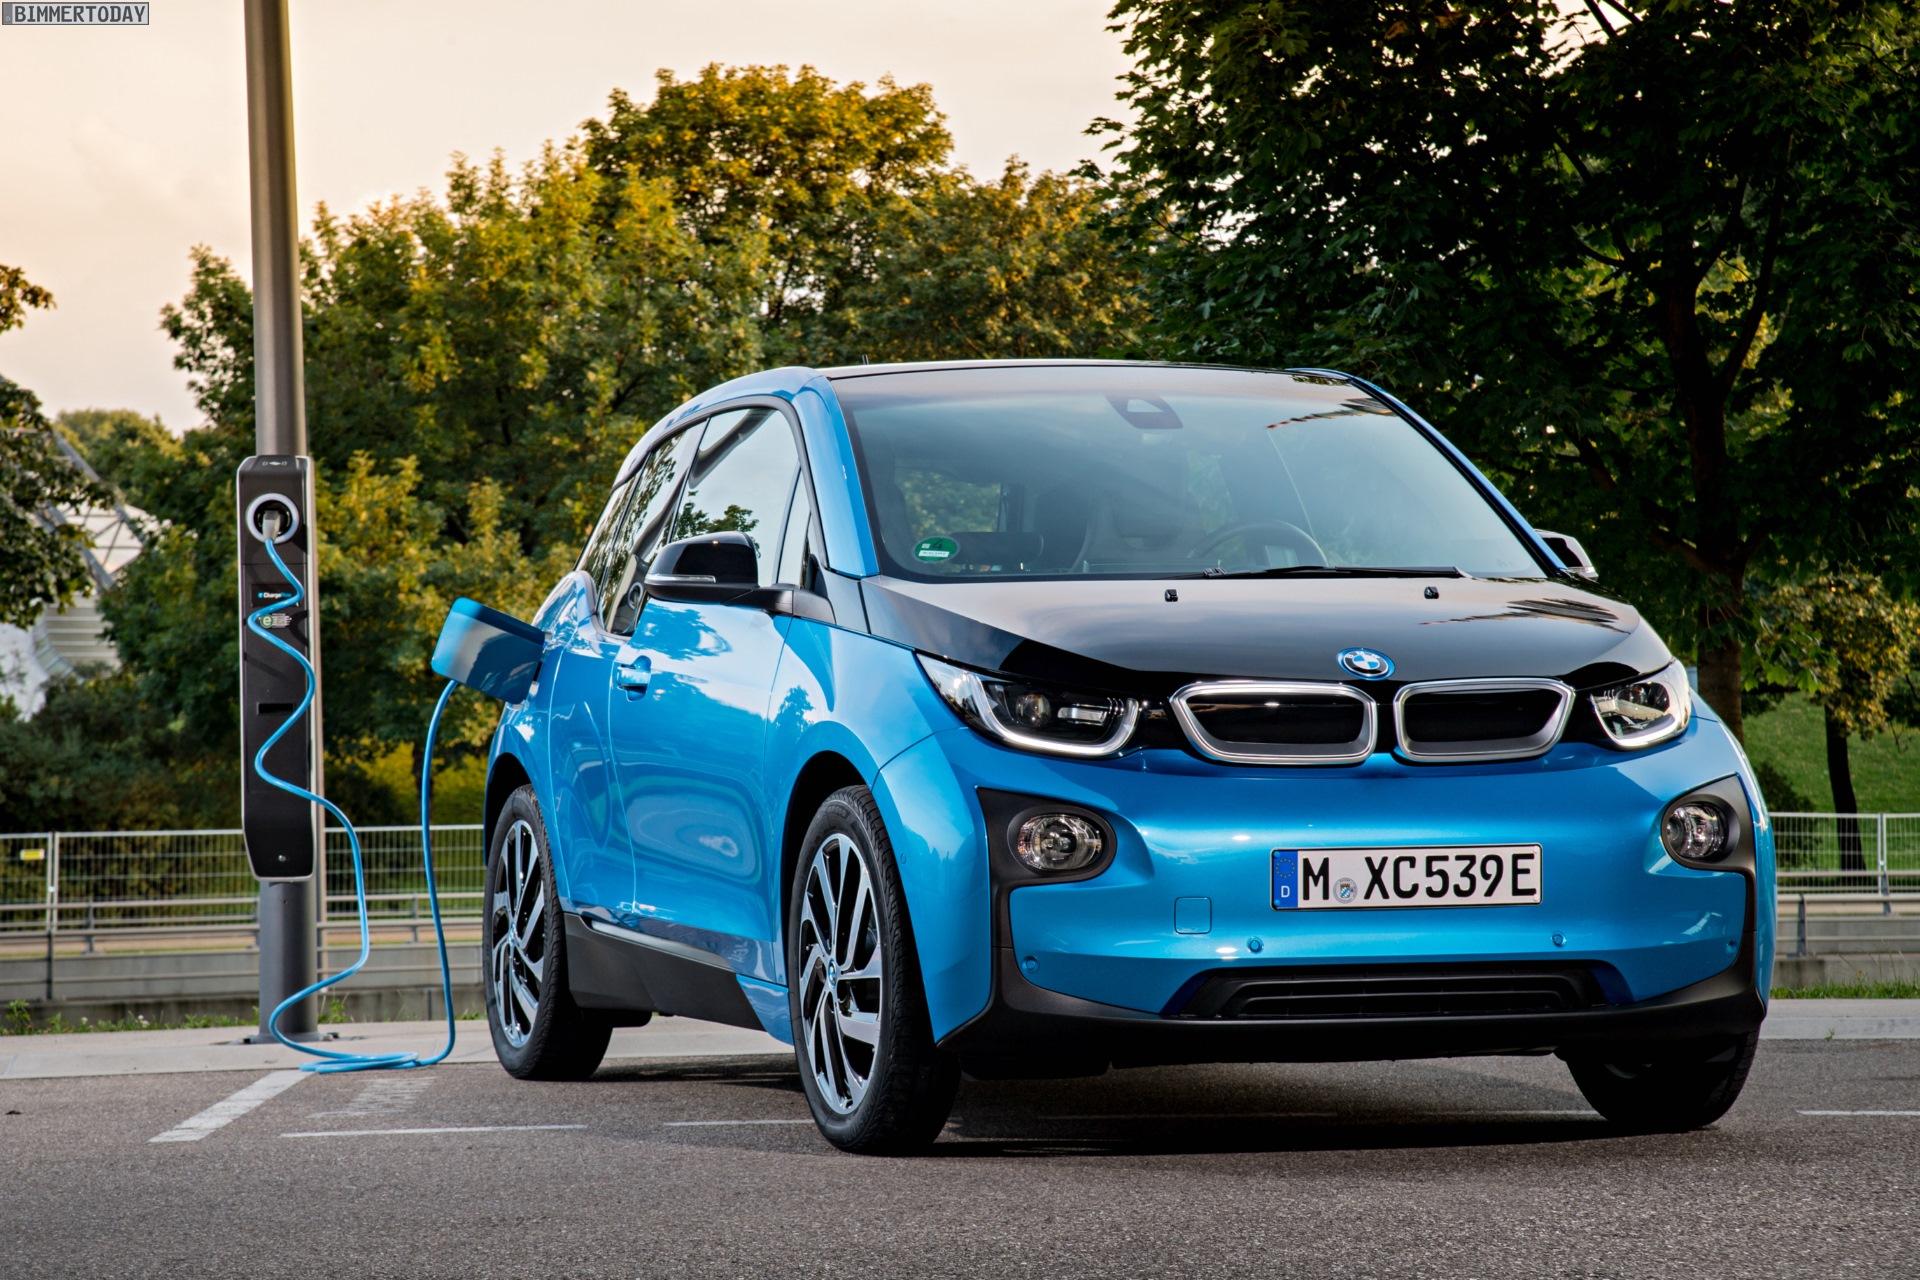 2016 BMW i3 94Ah Protonic Blue 33 kWh Elektroauto 23